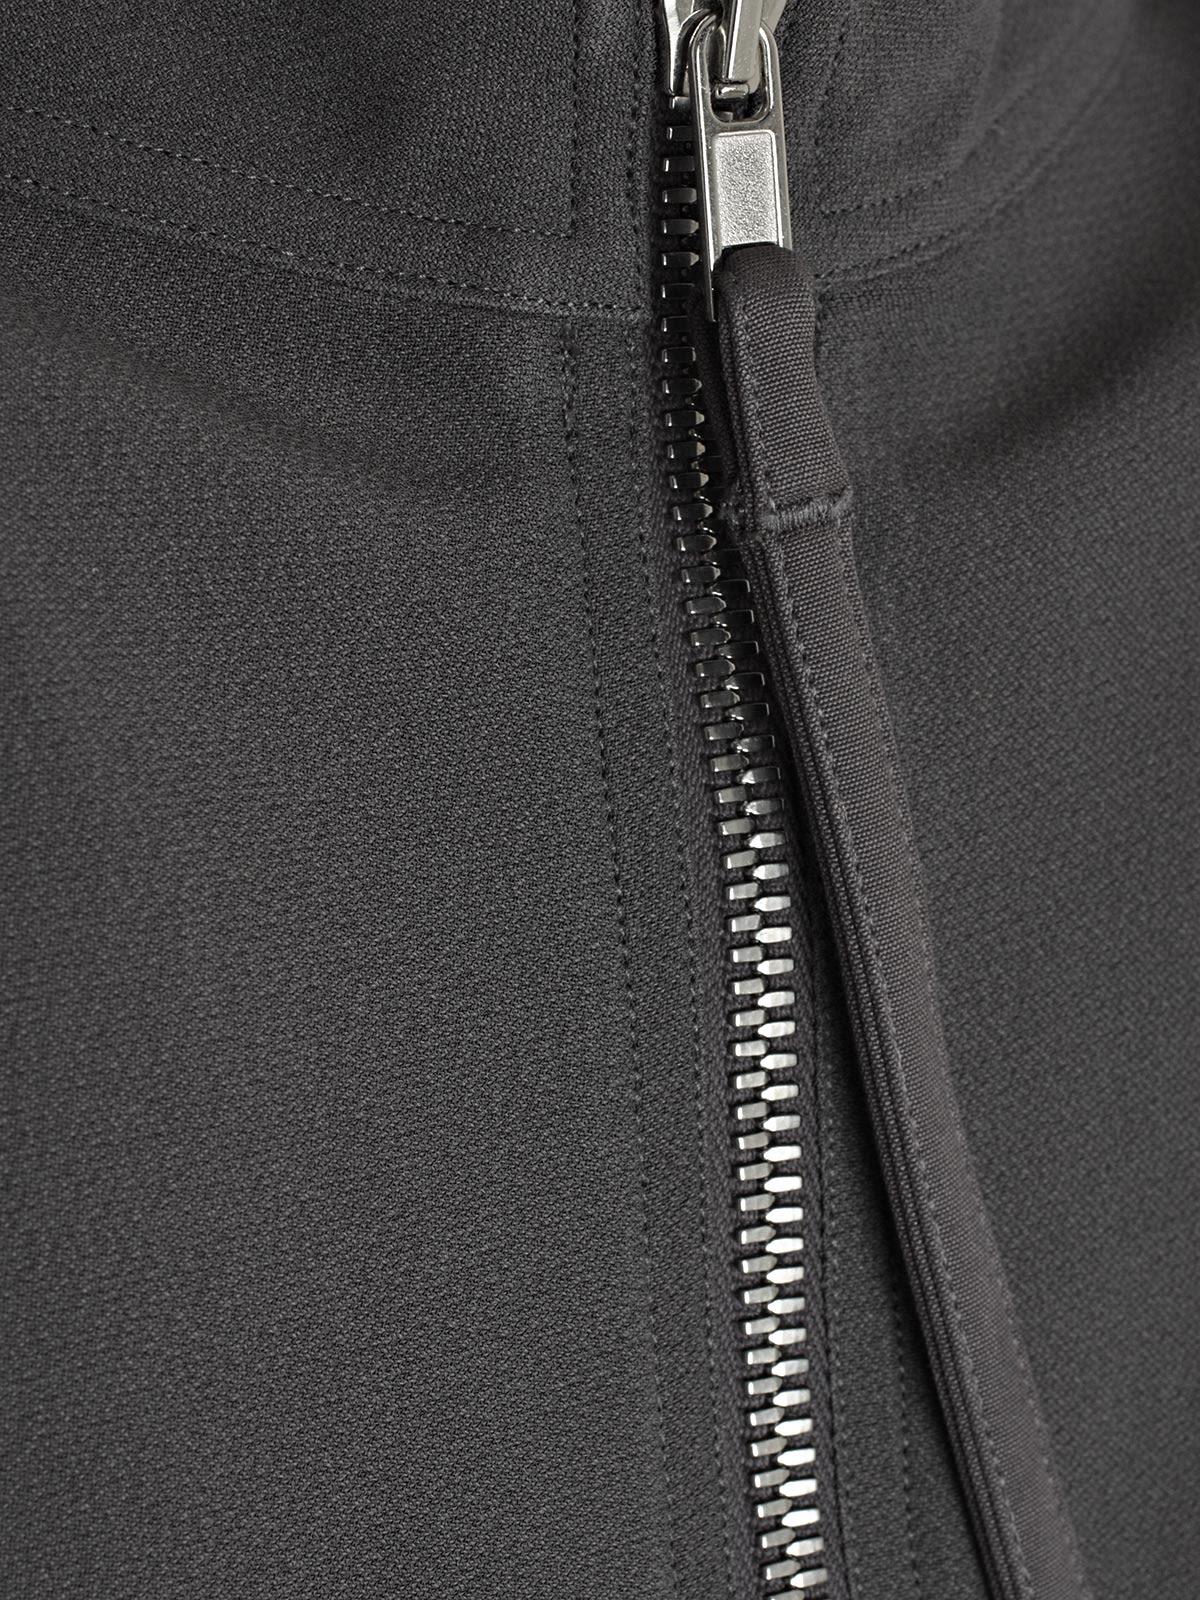 Rick Owens Short Sleeve T-Shirt